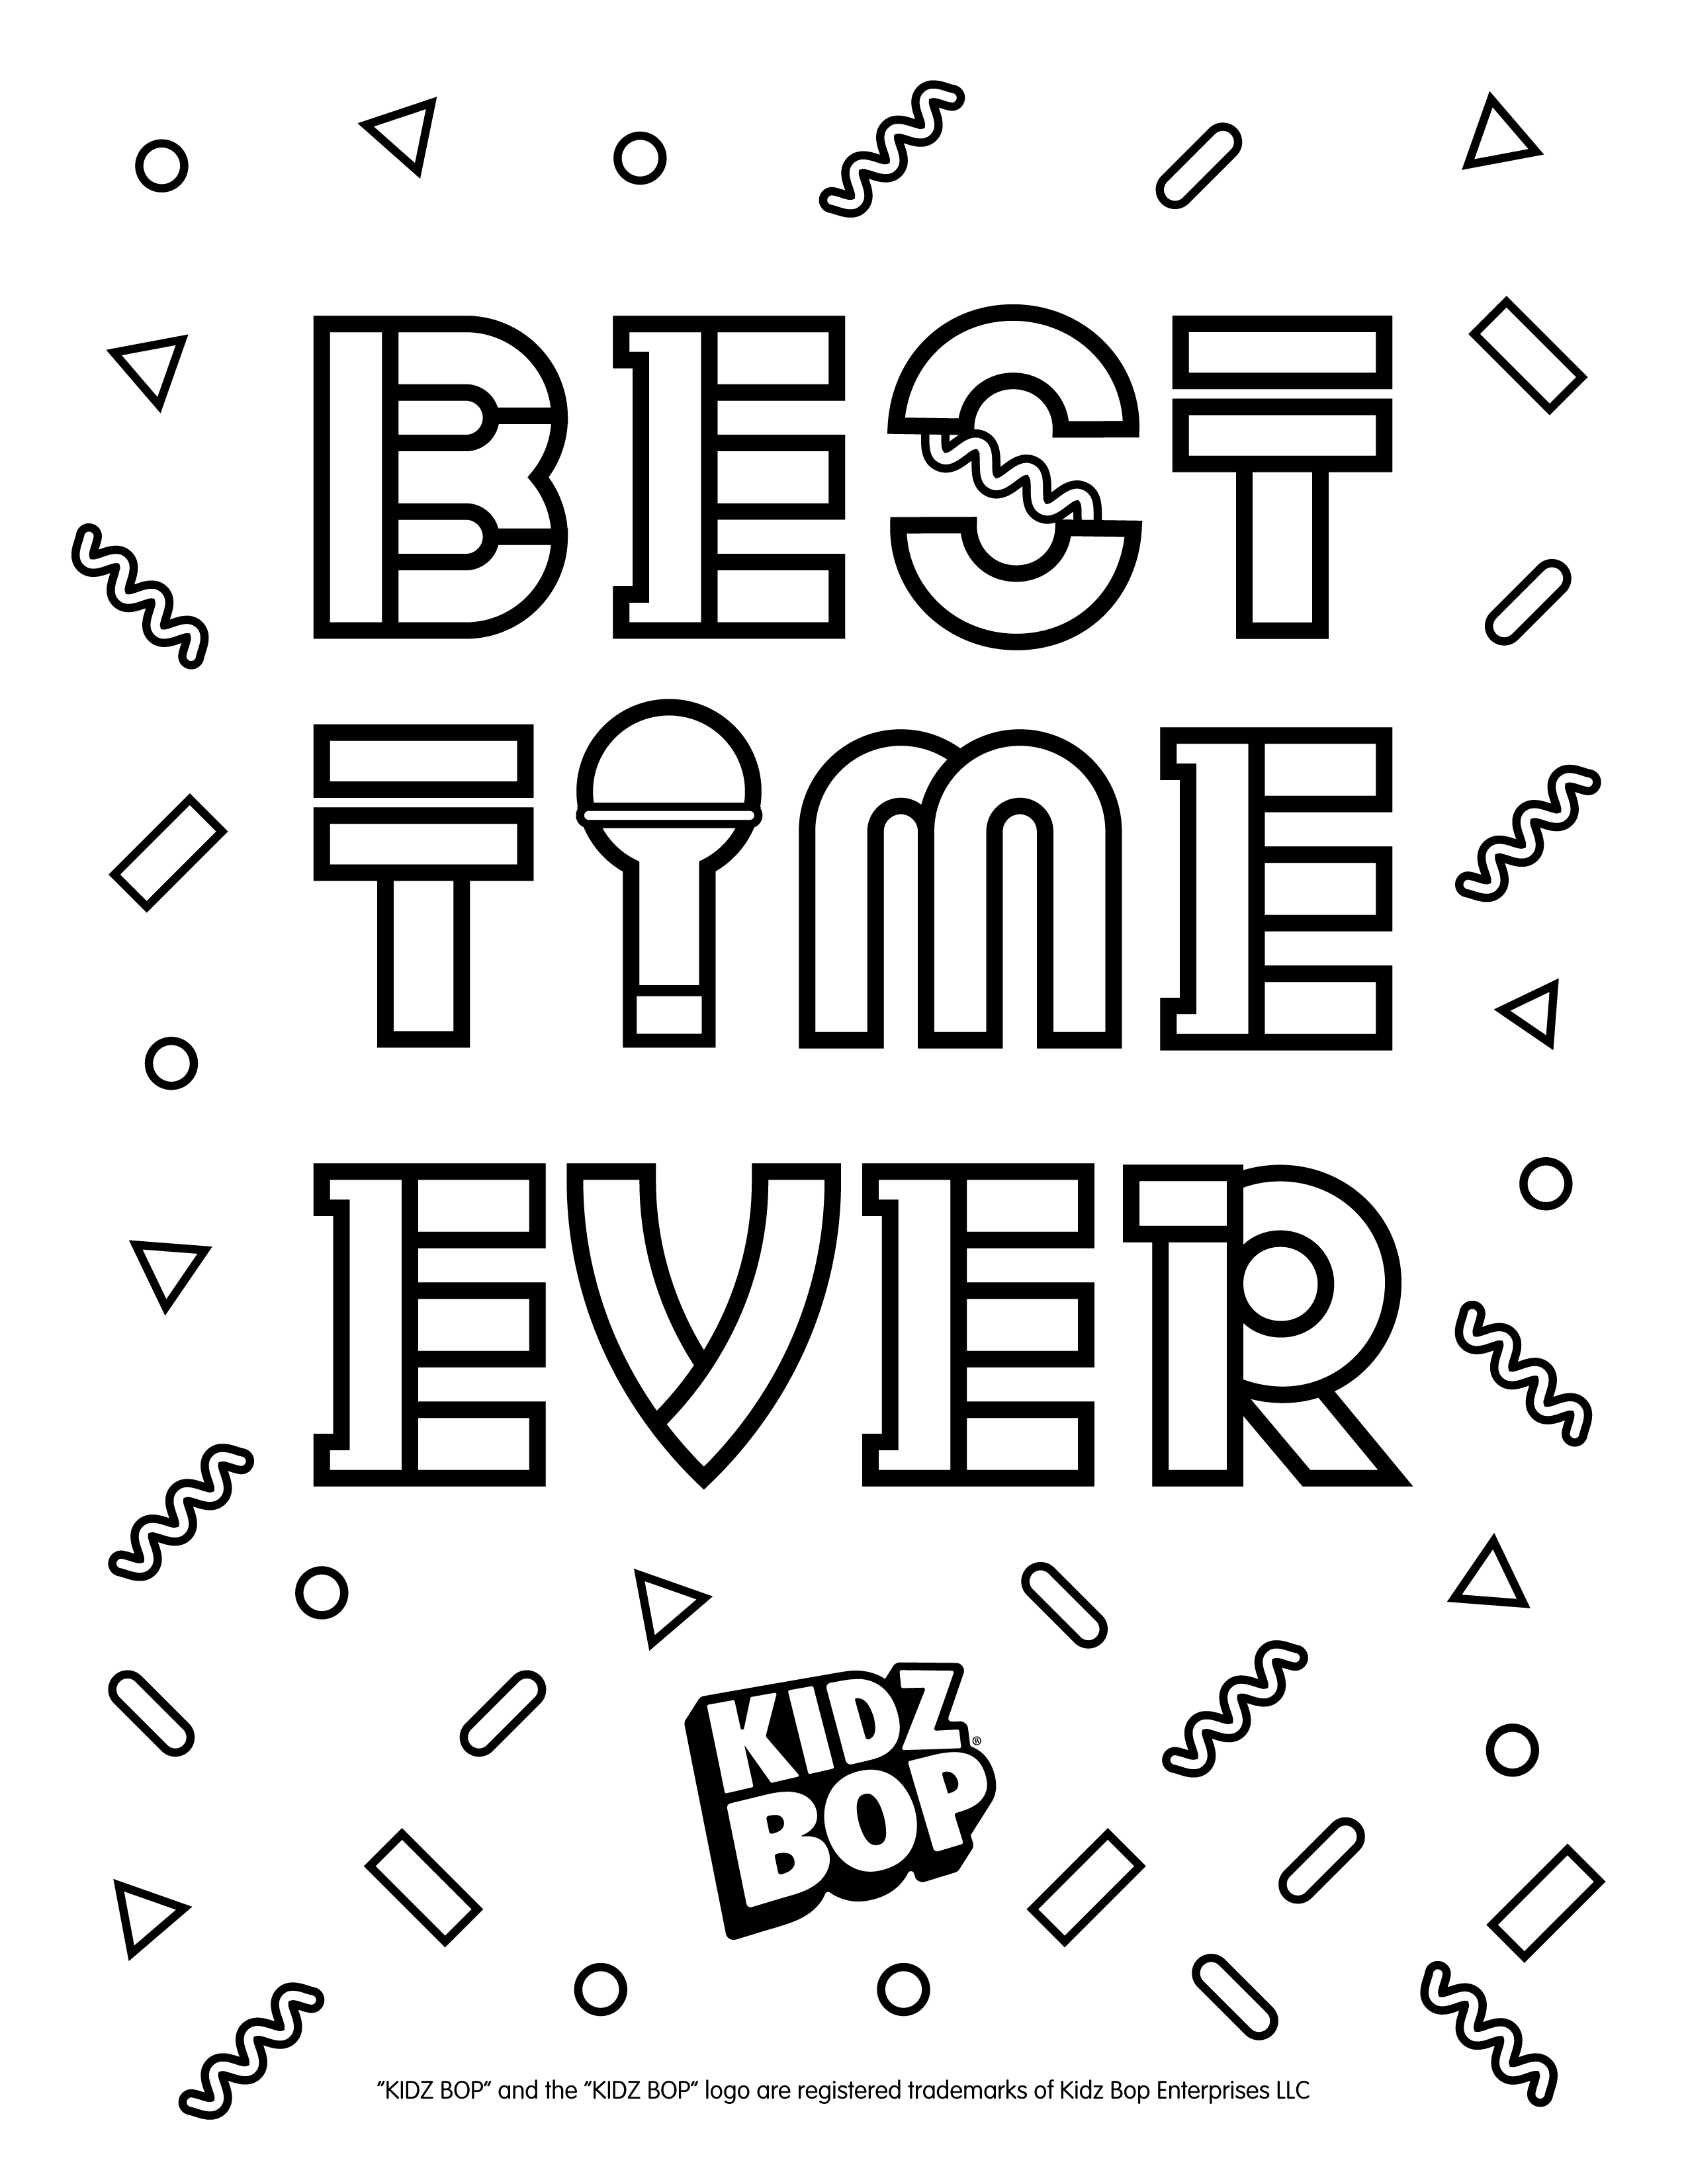 Pin on KIDZ BOP Music & Movement Ideas